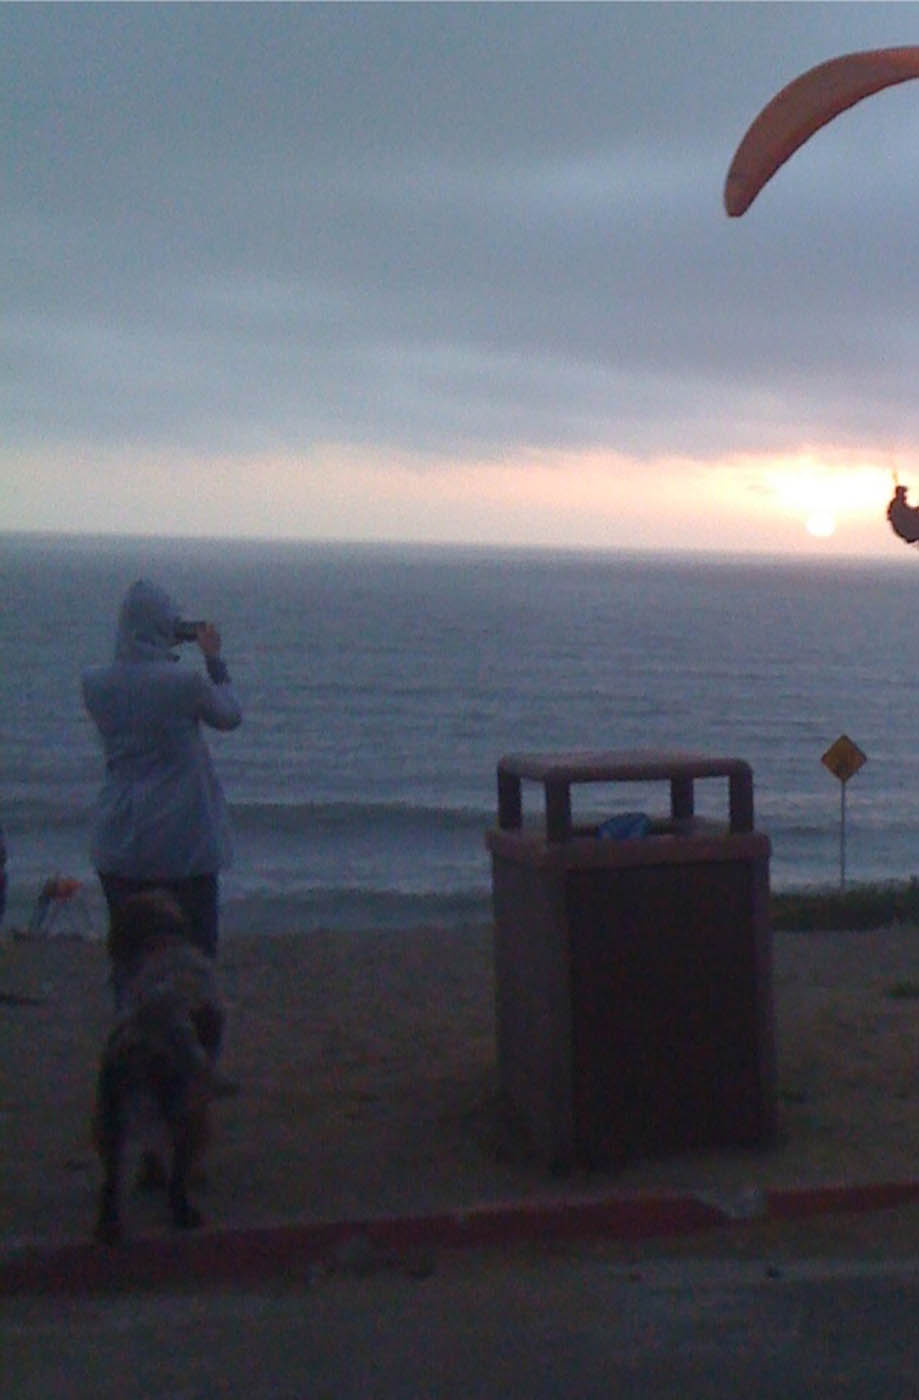 Pacifica kite_web.jpg